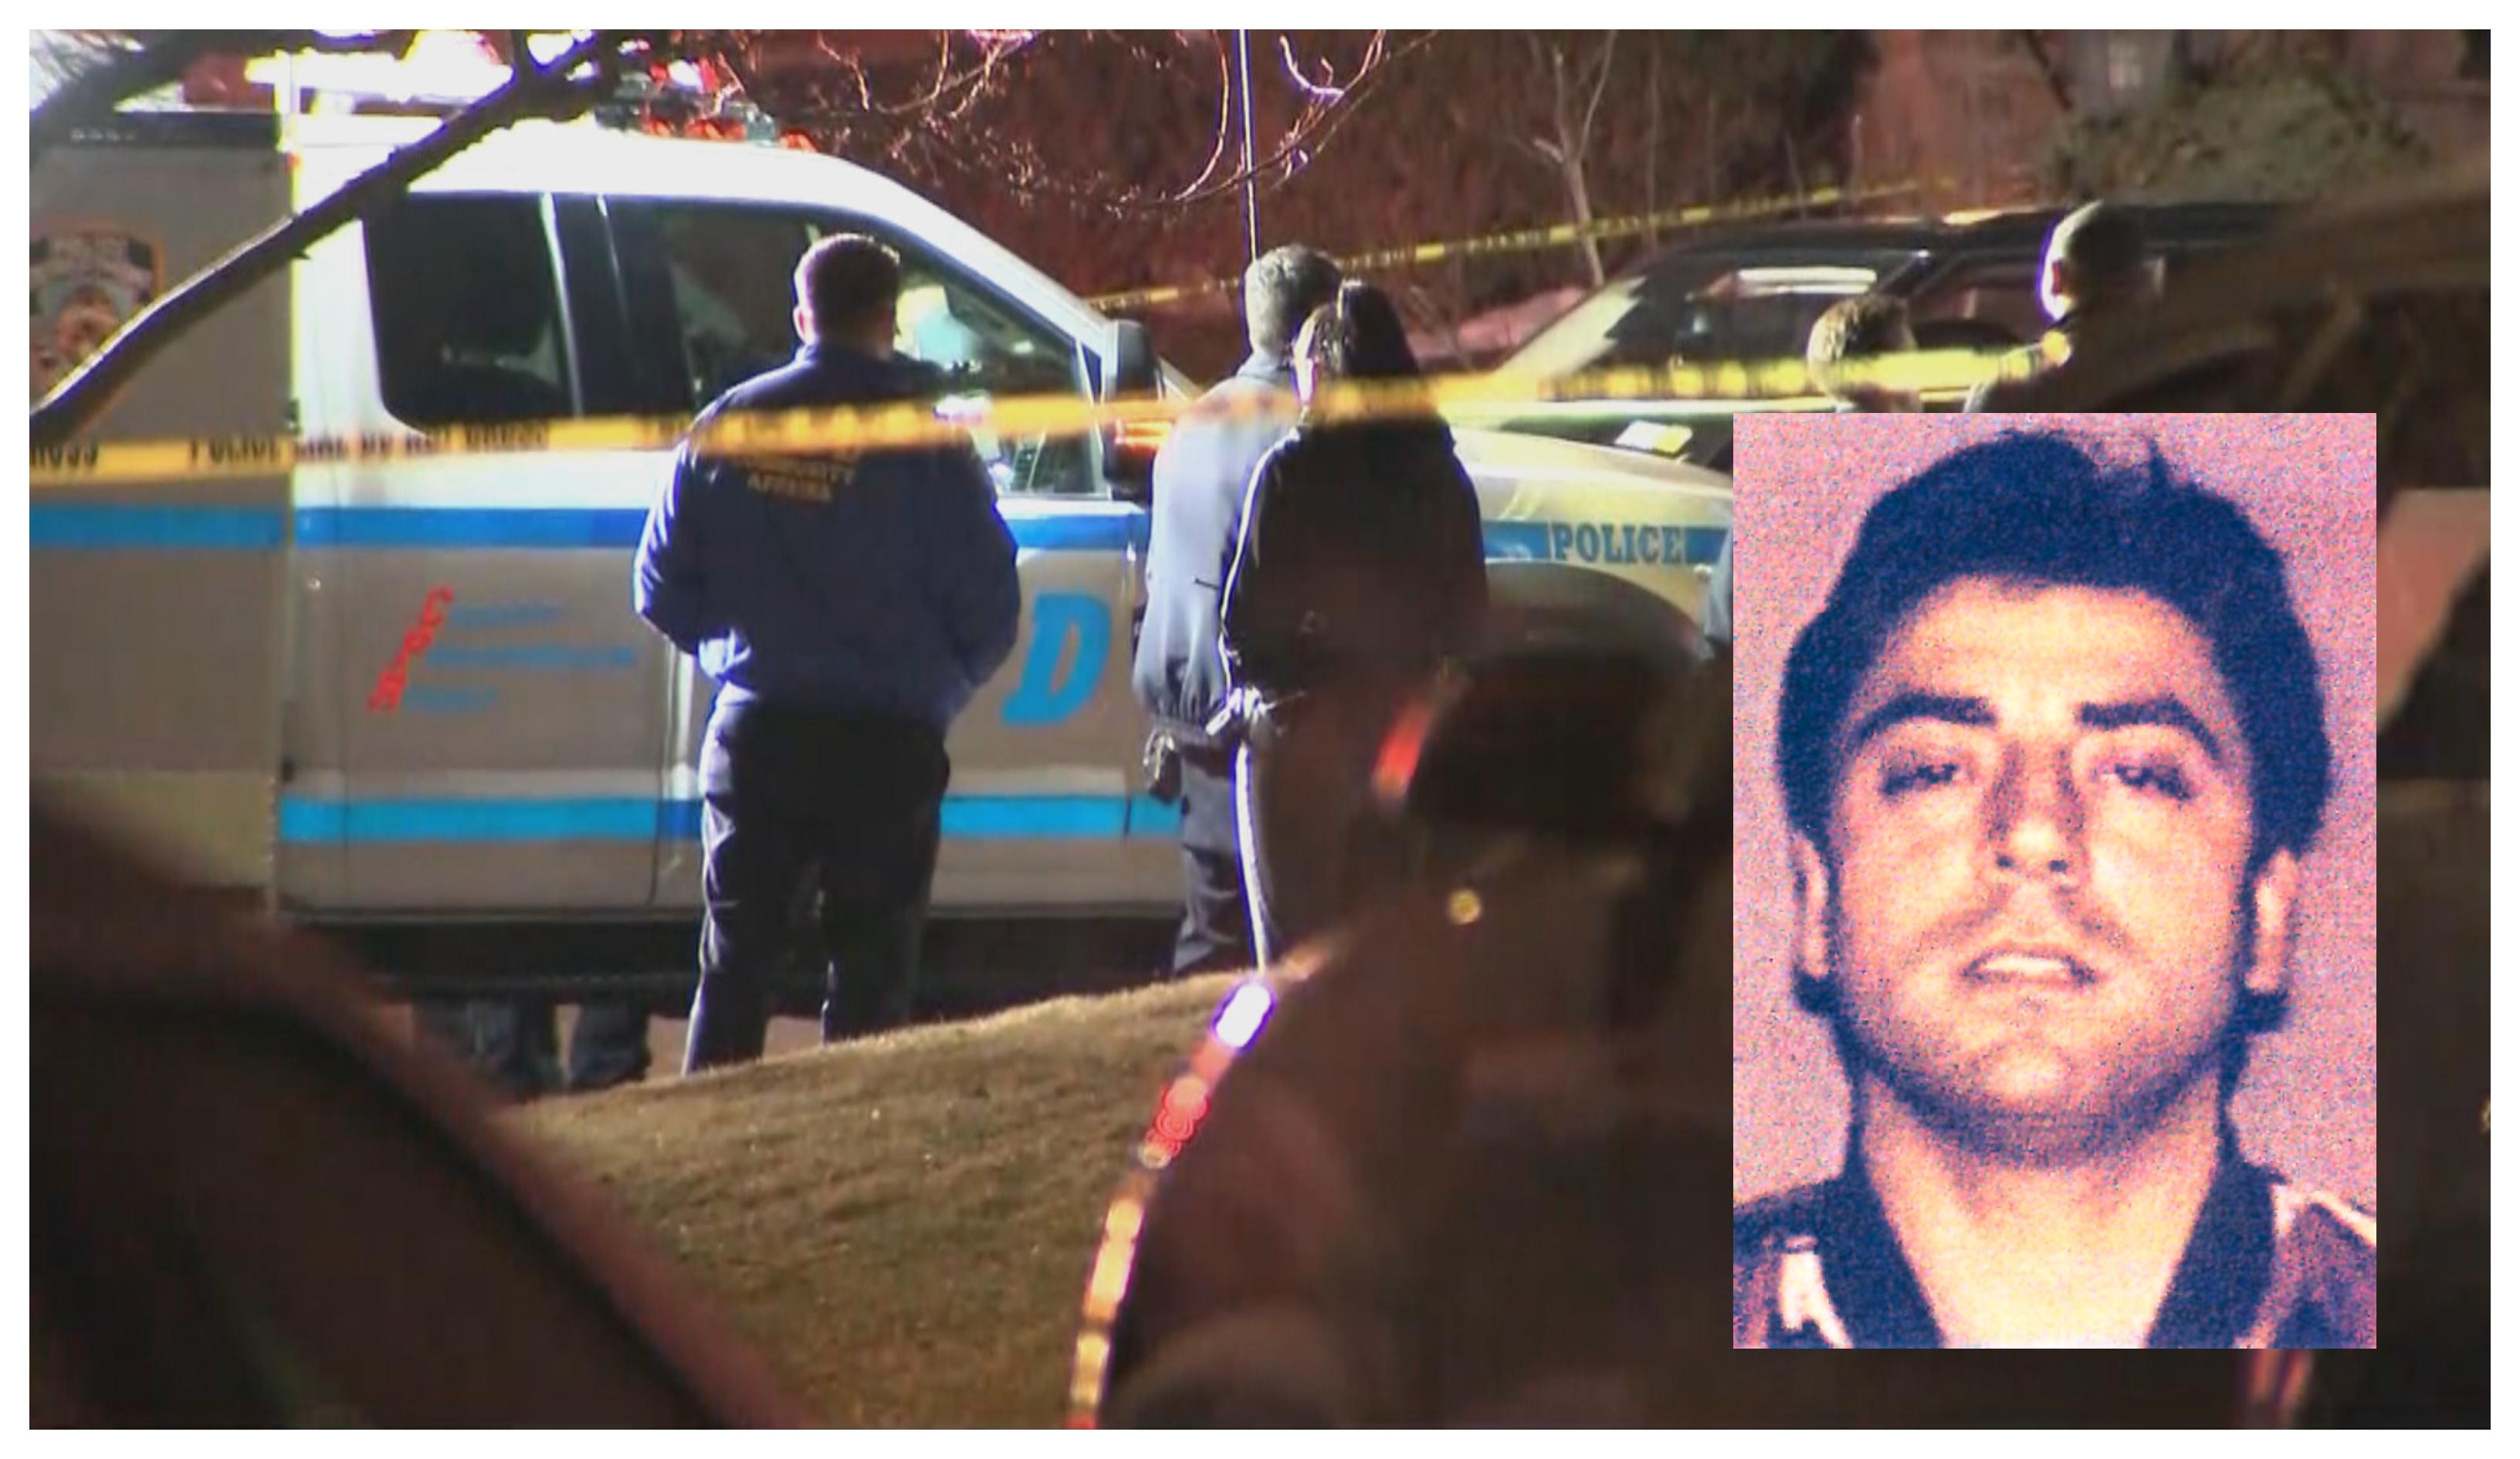 Asesinado el jefe mafioso Frank Cali | EL FRENTE